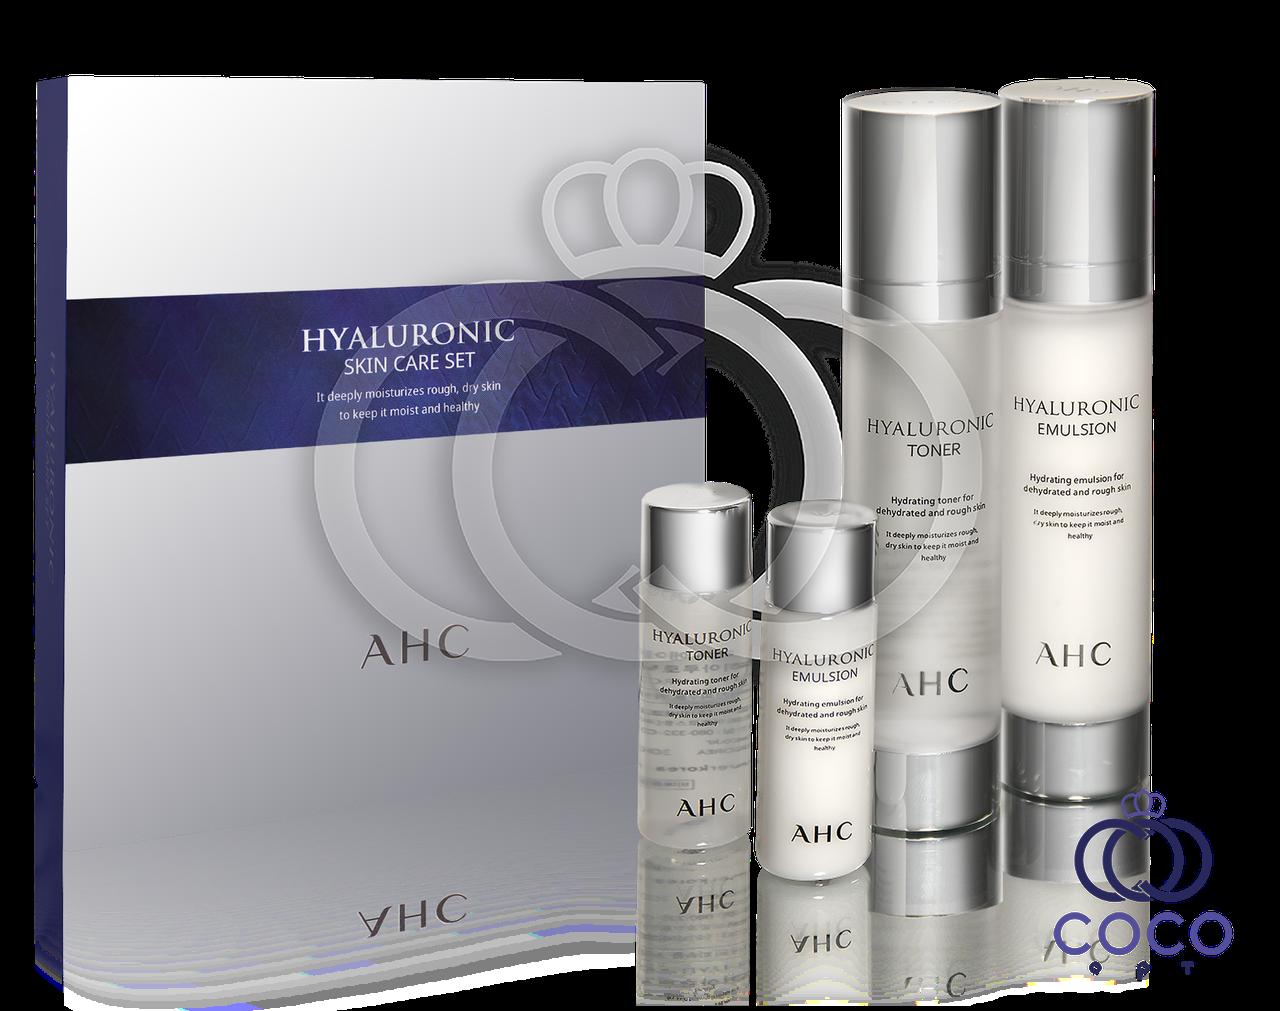 Корейский набор по уходу за кожей с комплексом гиалуроновых кислот AHC Hyaluronic Skin Care Set ( качество оригинала)